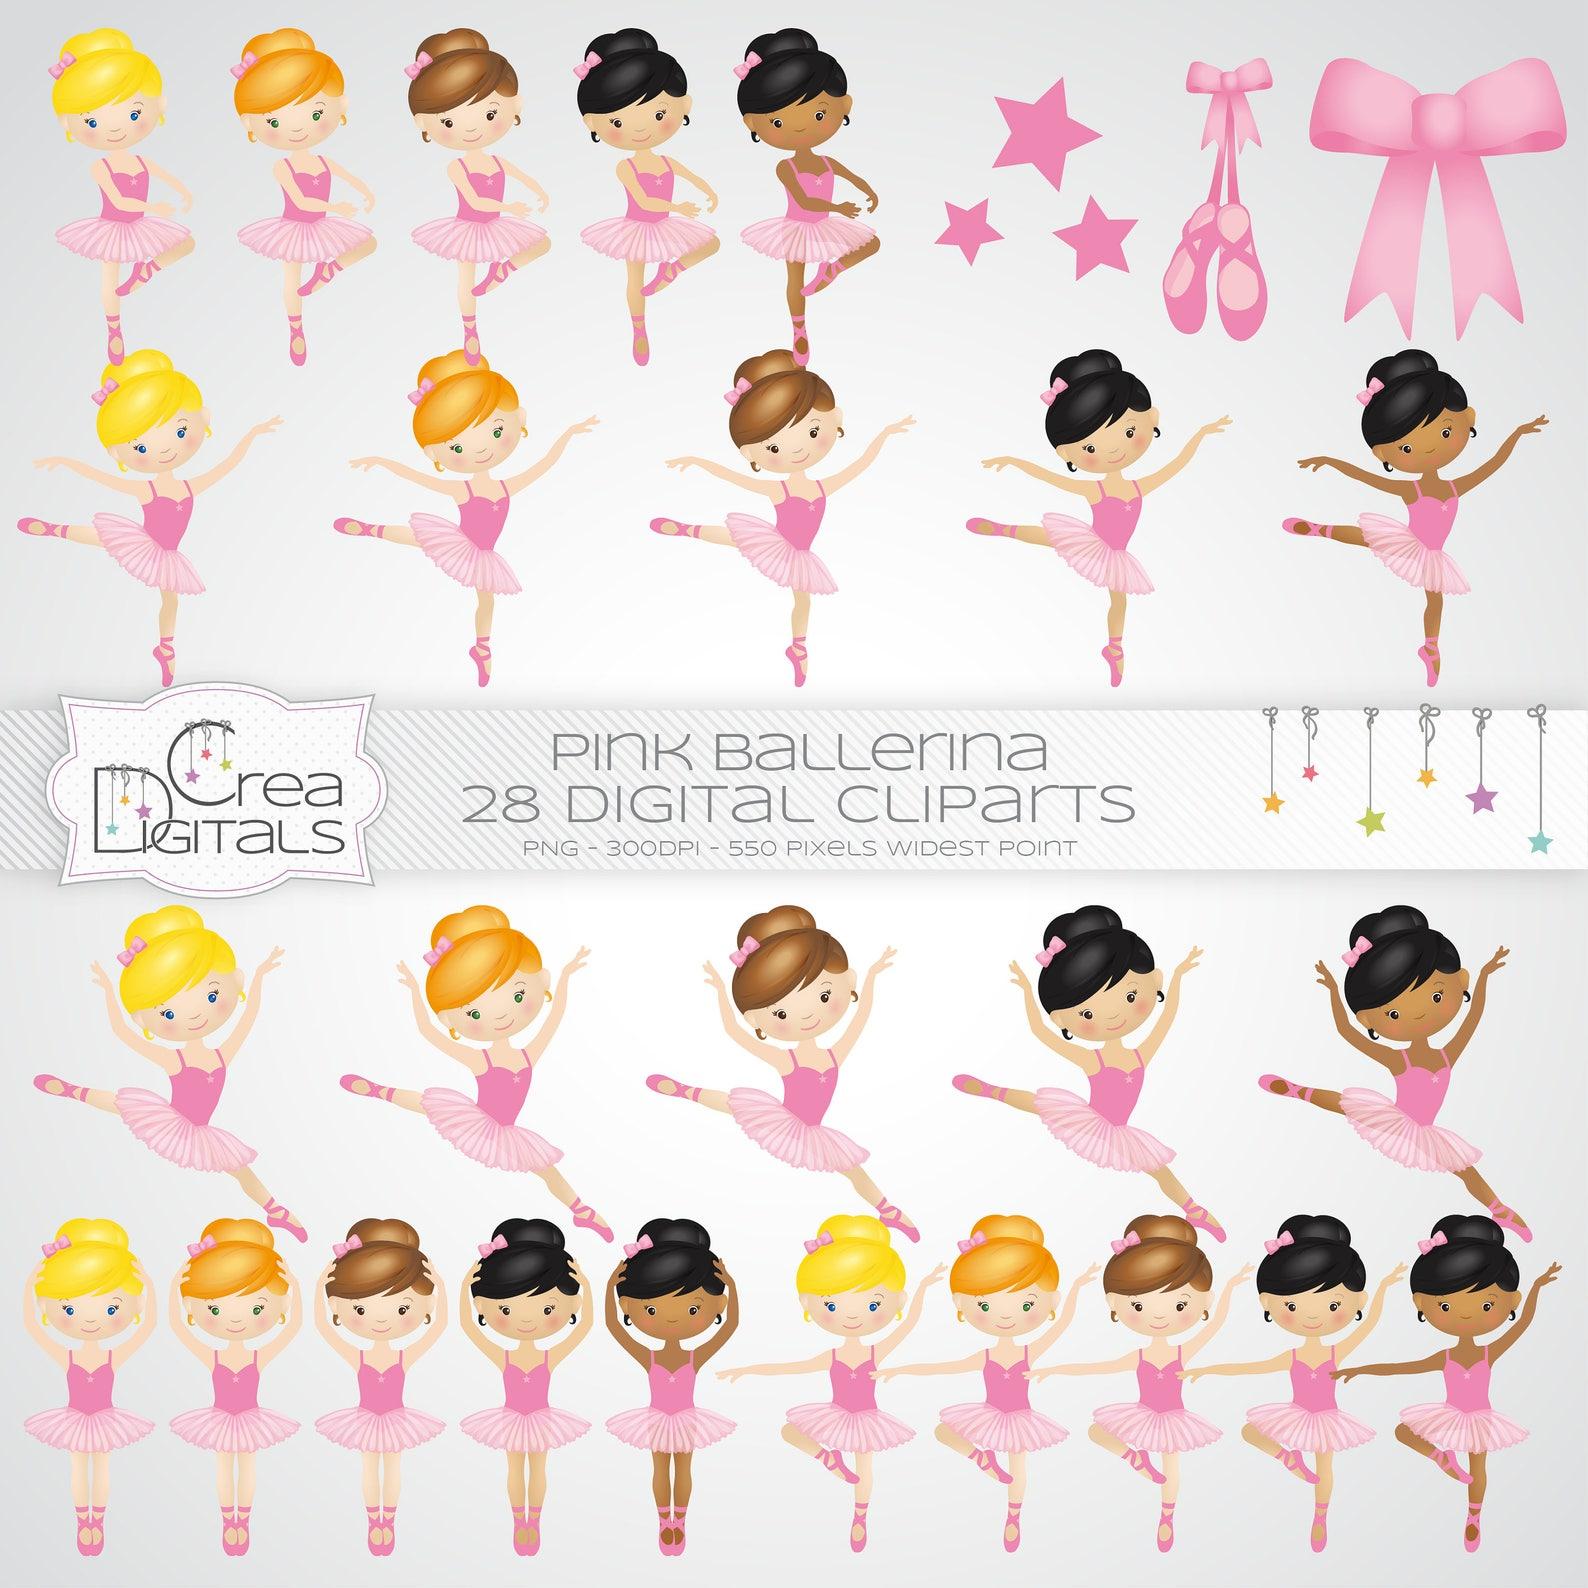 ballerina cliparts - pink ballet dancer - ballerina gala - 28 digital cliparts - instant download